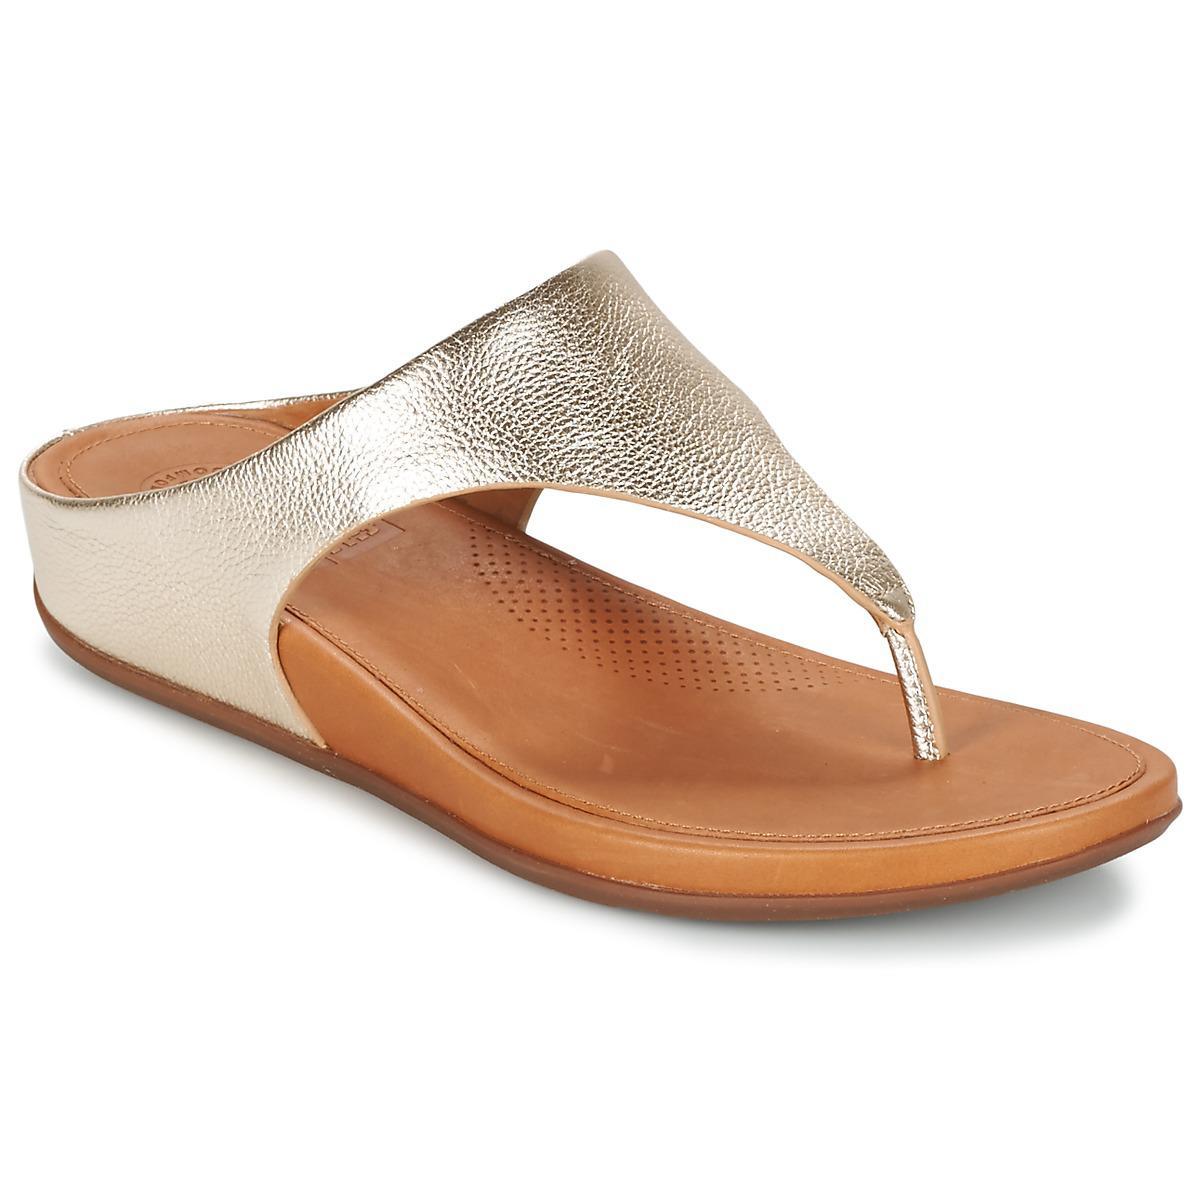 ab41e0b0e Fitflop Banda Women s Flip Flops   Sandals (shoes) In Gold in ...